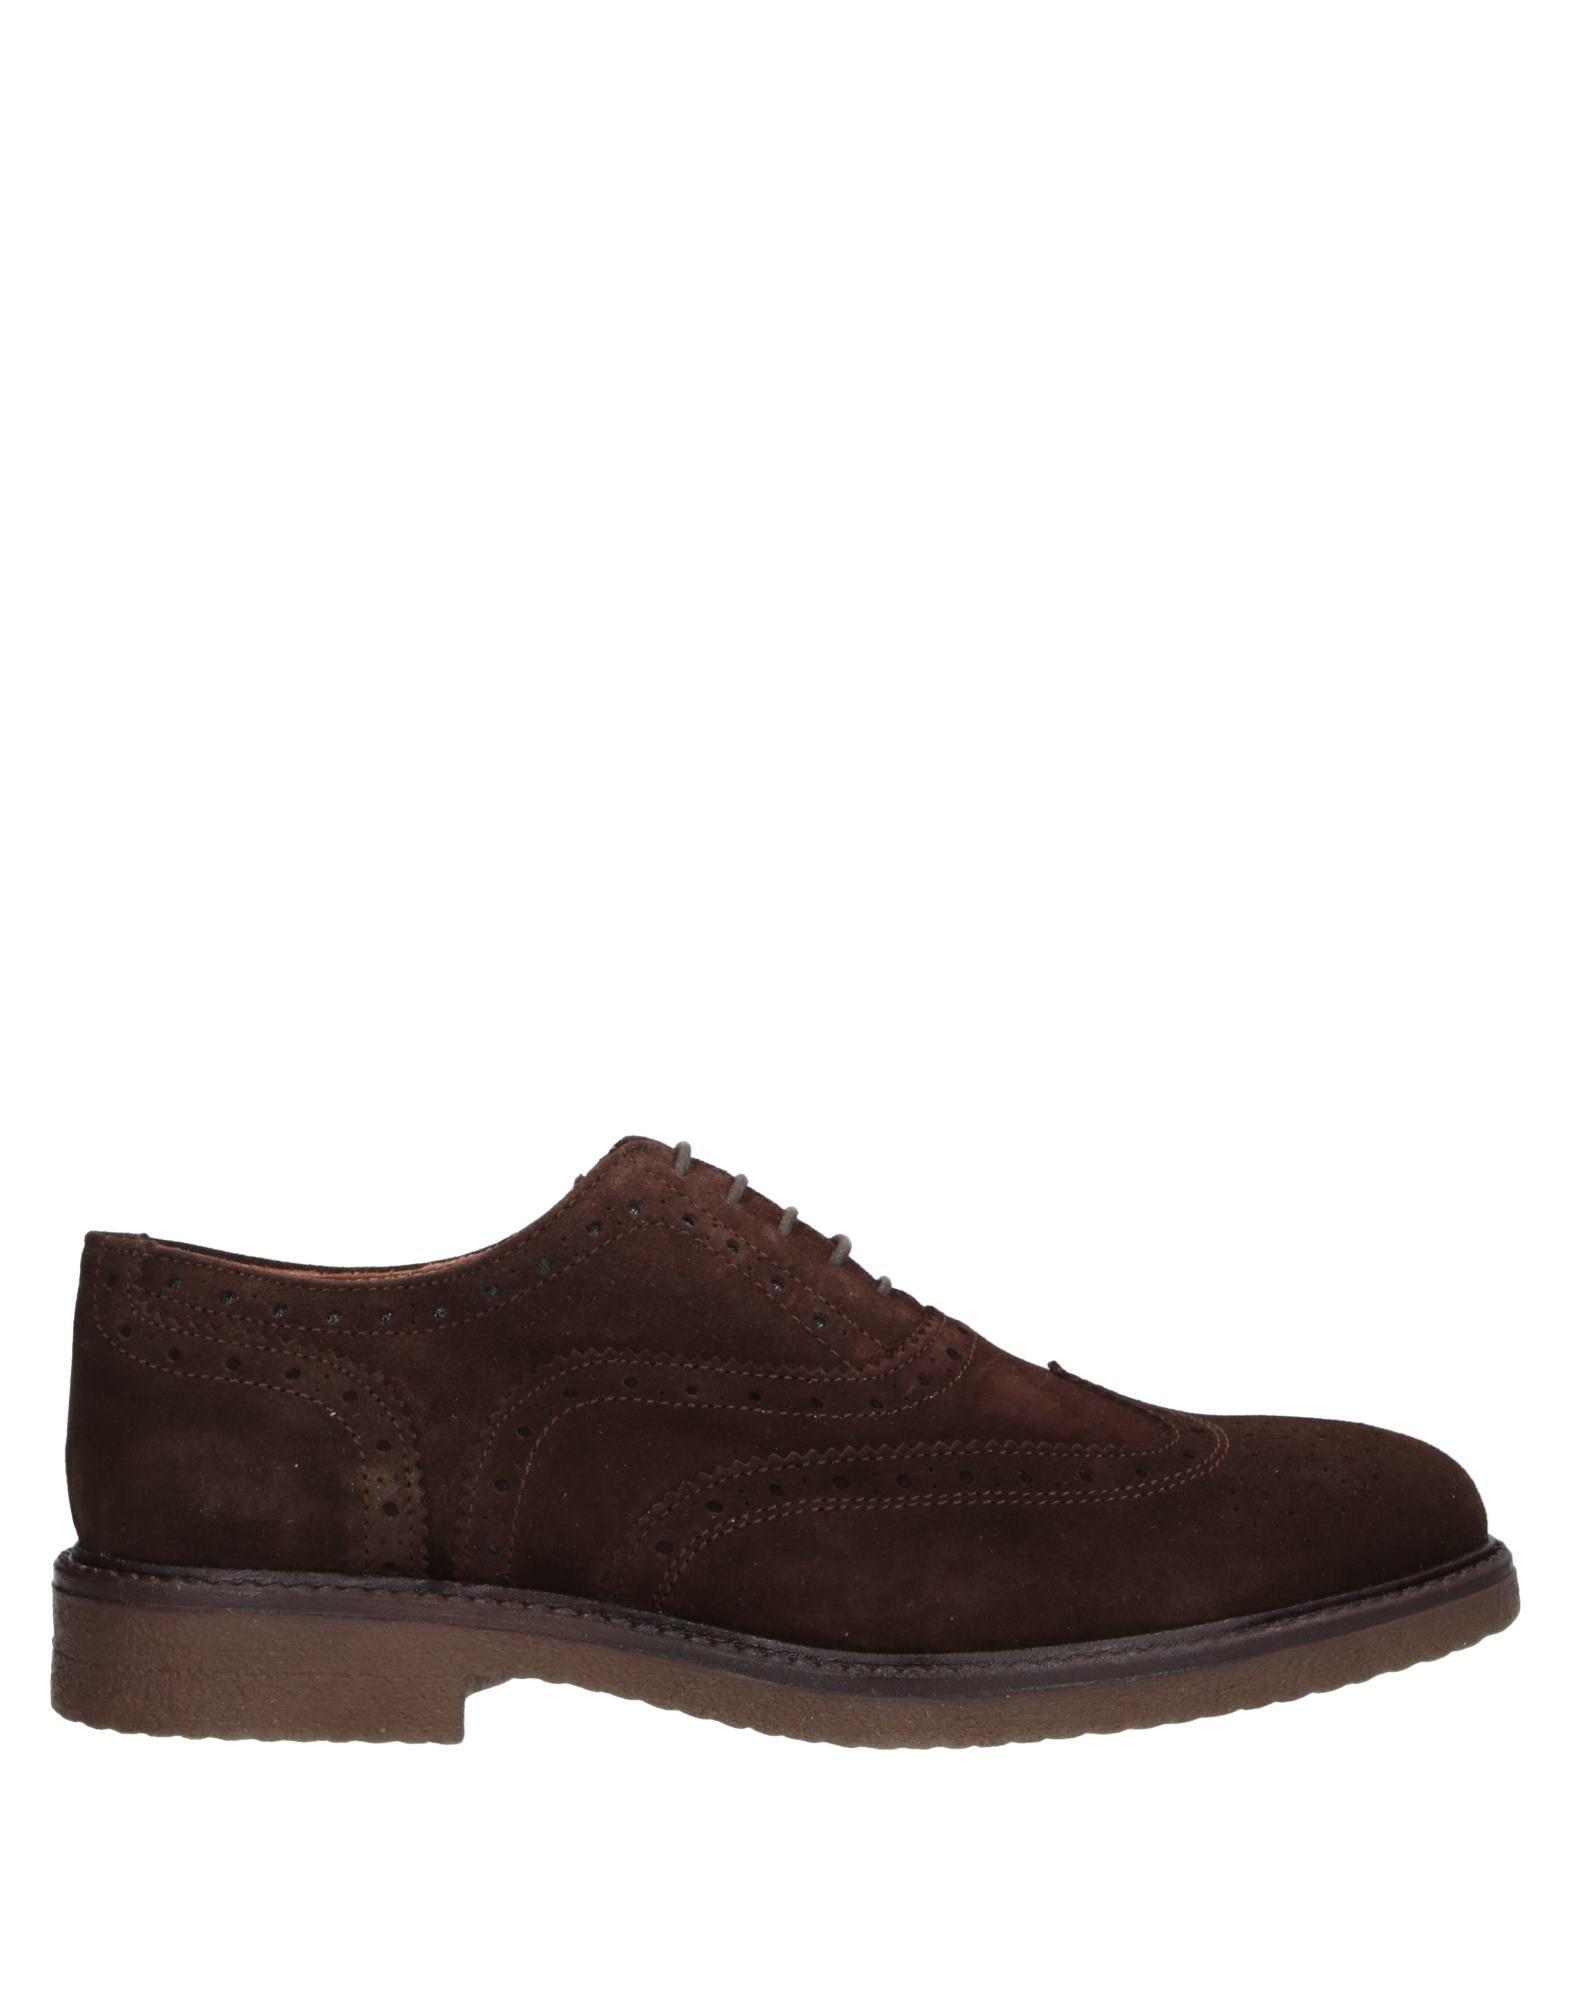 Chaussures À Lacets At.P.Co Homme - Chaussures À Lacets At.P.Co   - 11715190WM